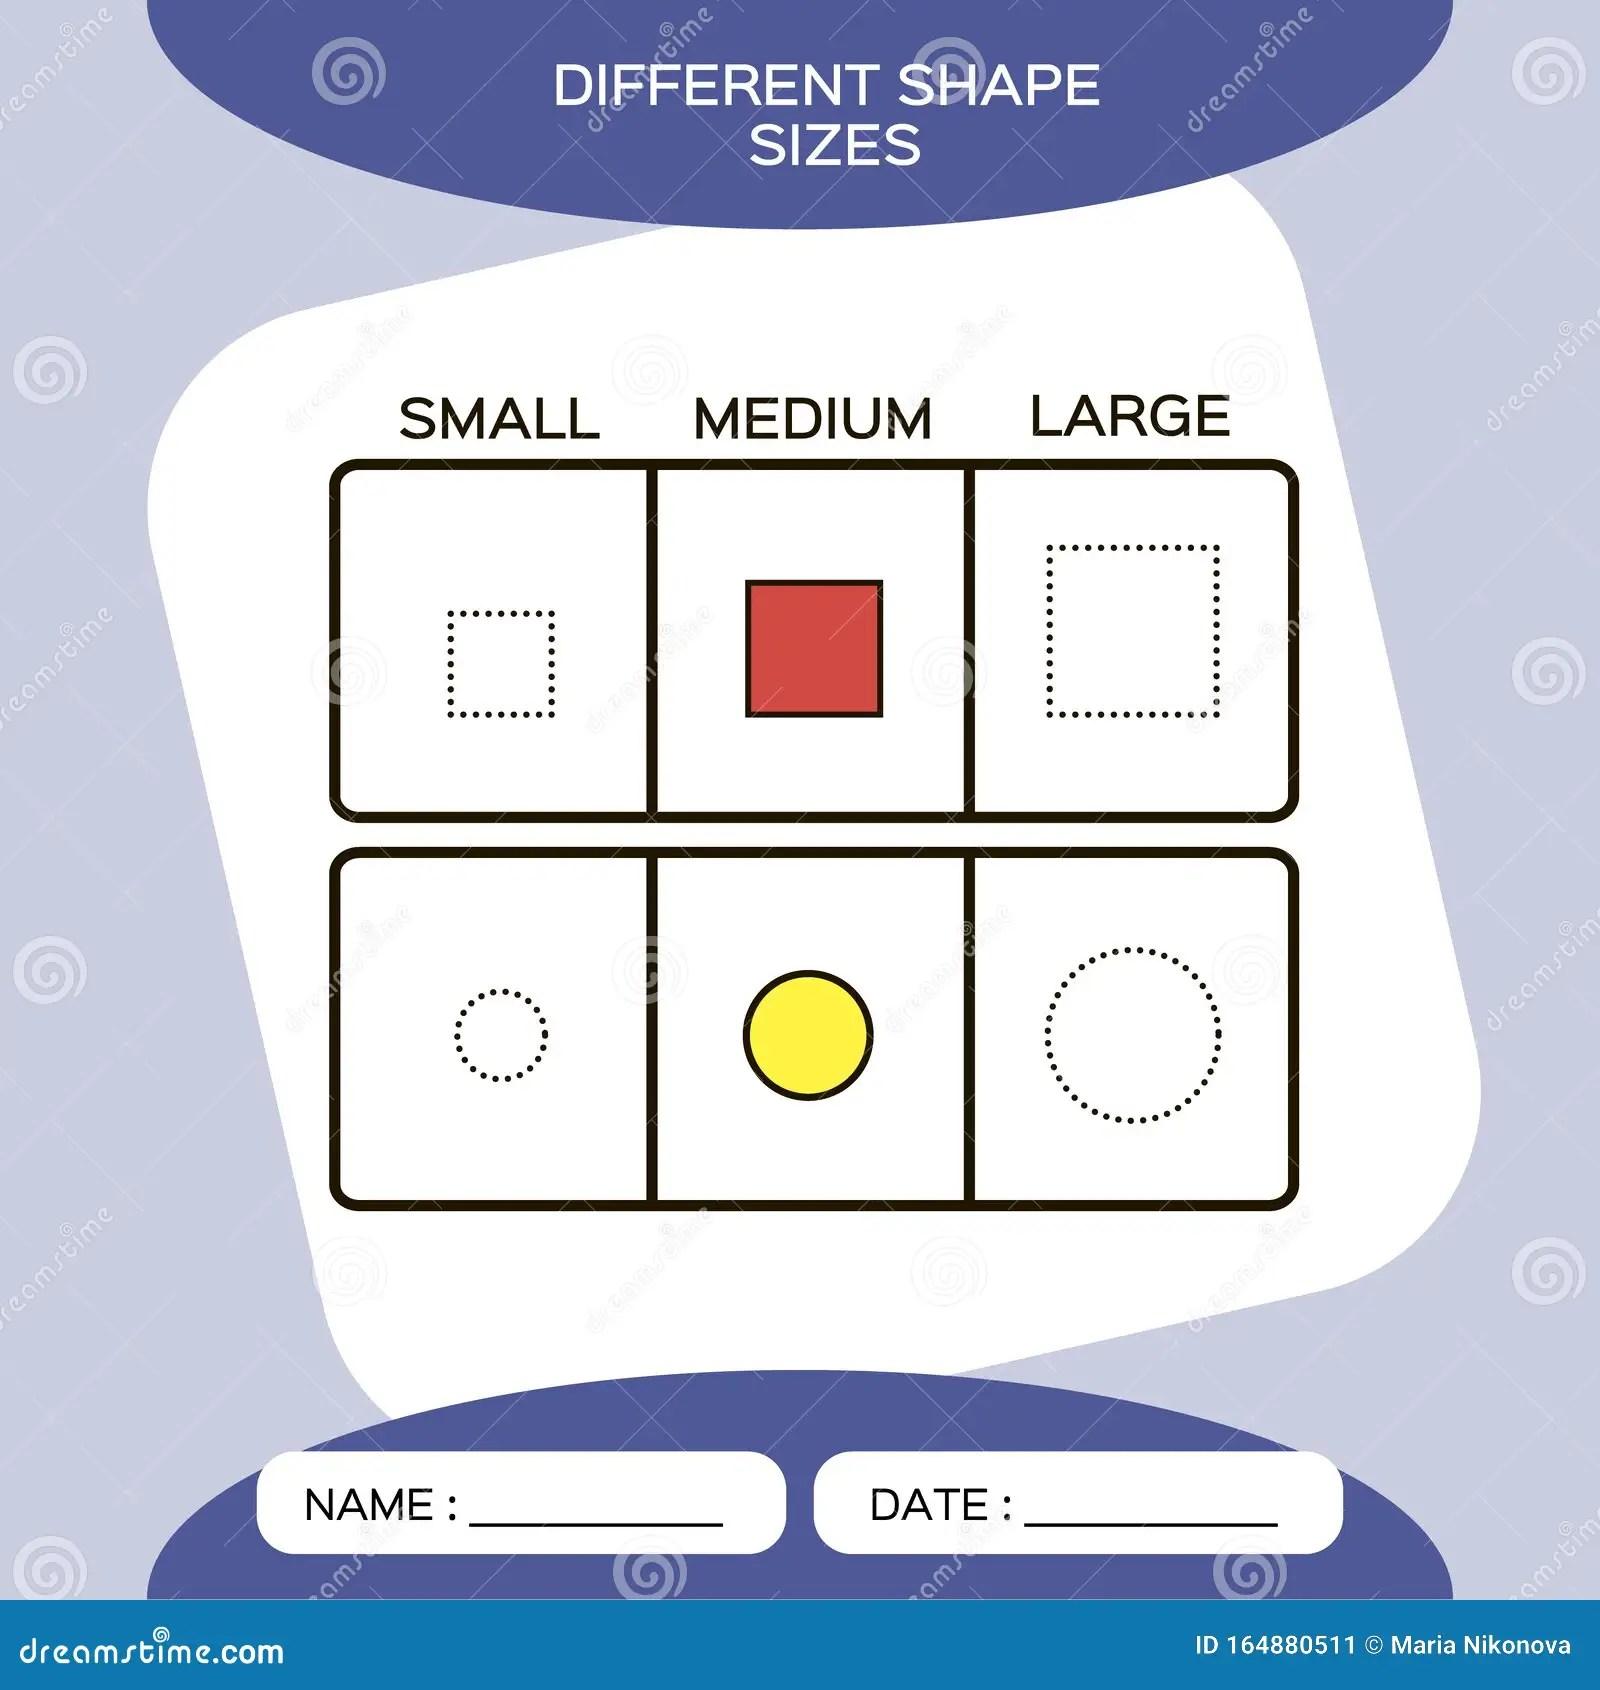 Differnt Shape Sizes Small Medium Large Matching